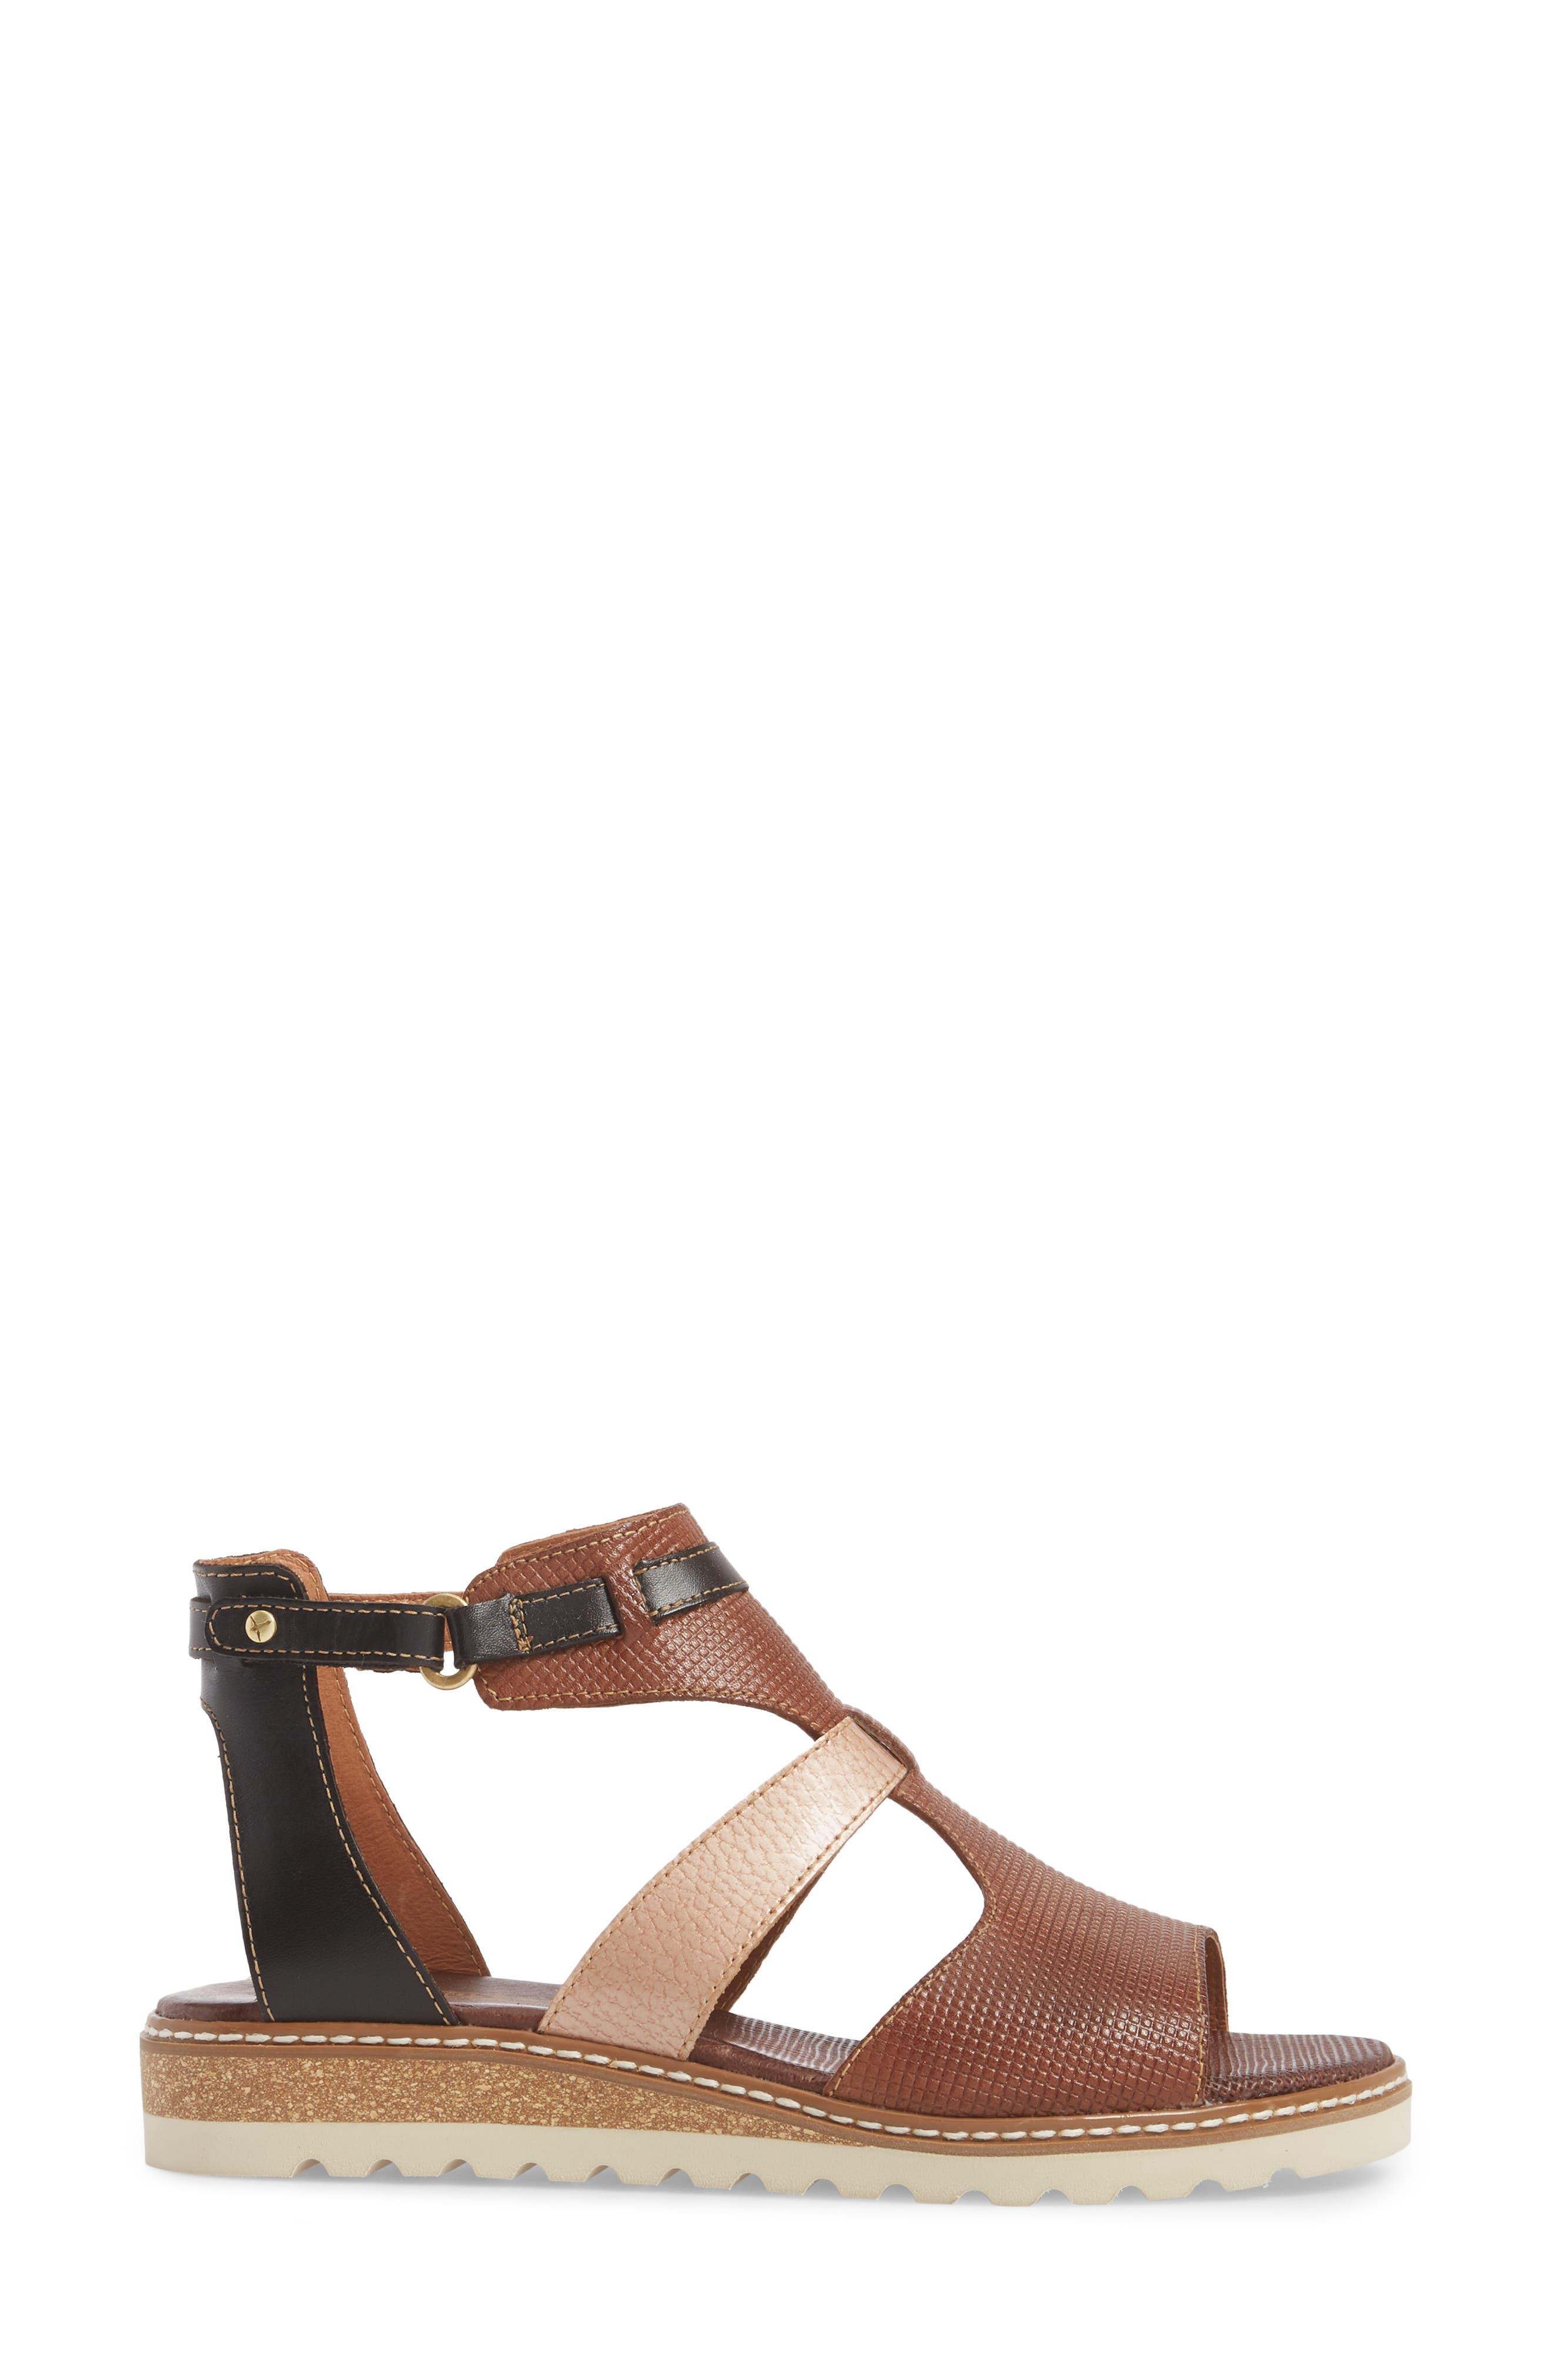 Alcudia Sandal,                             Alternate thumbnail 3, color,                             Cuero Leather